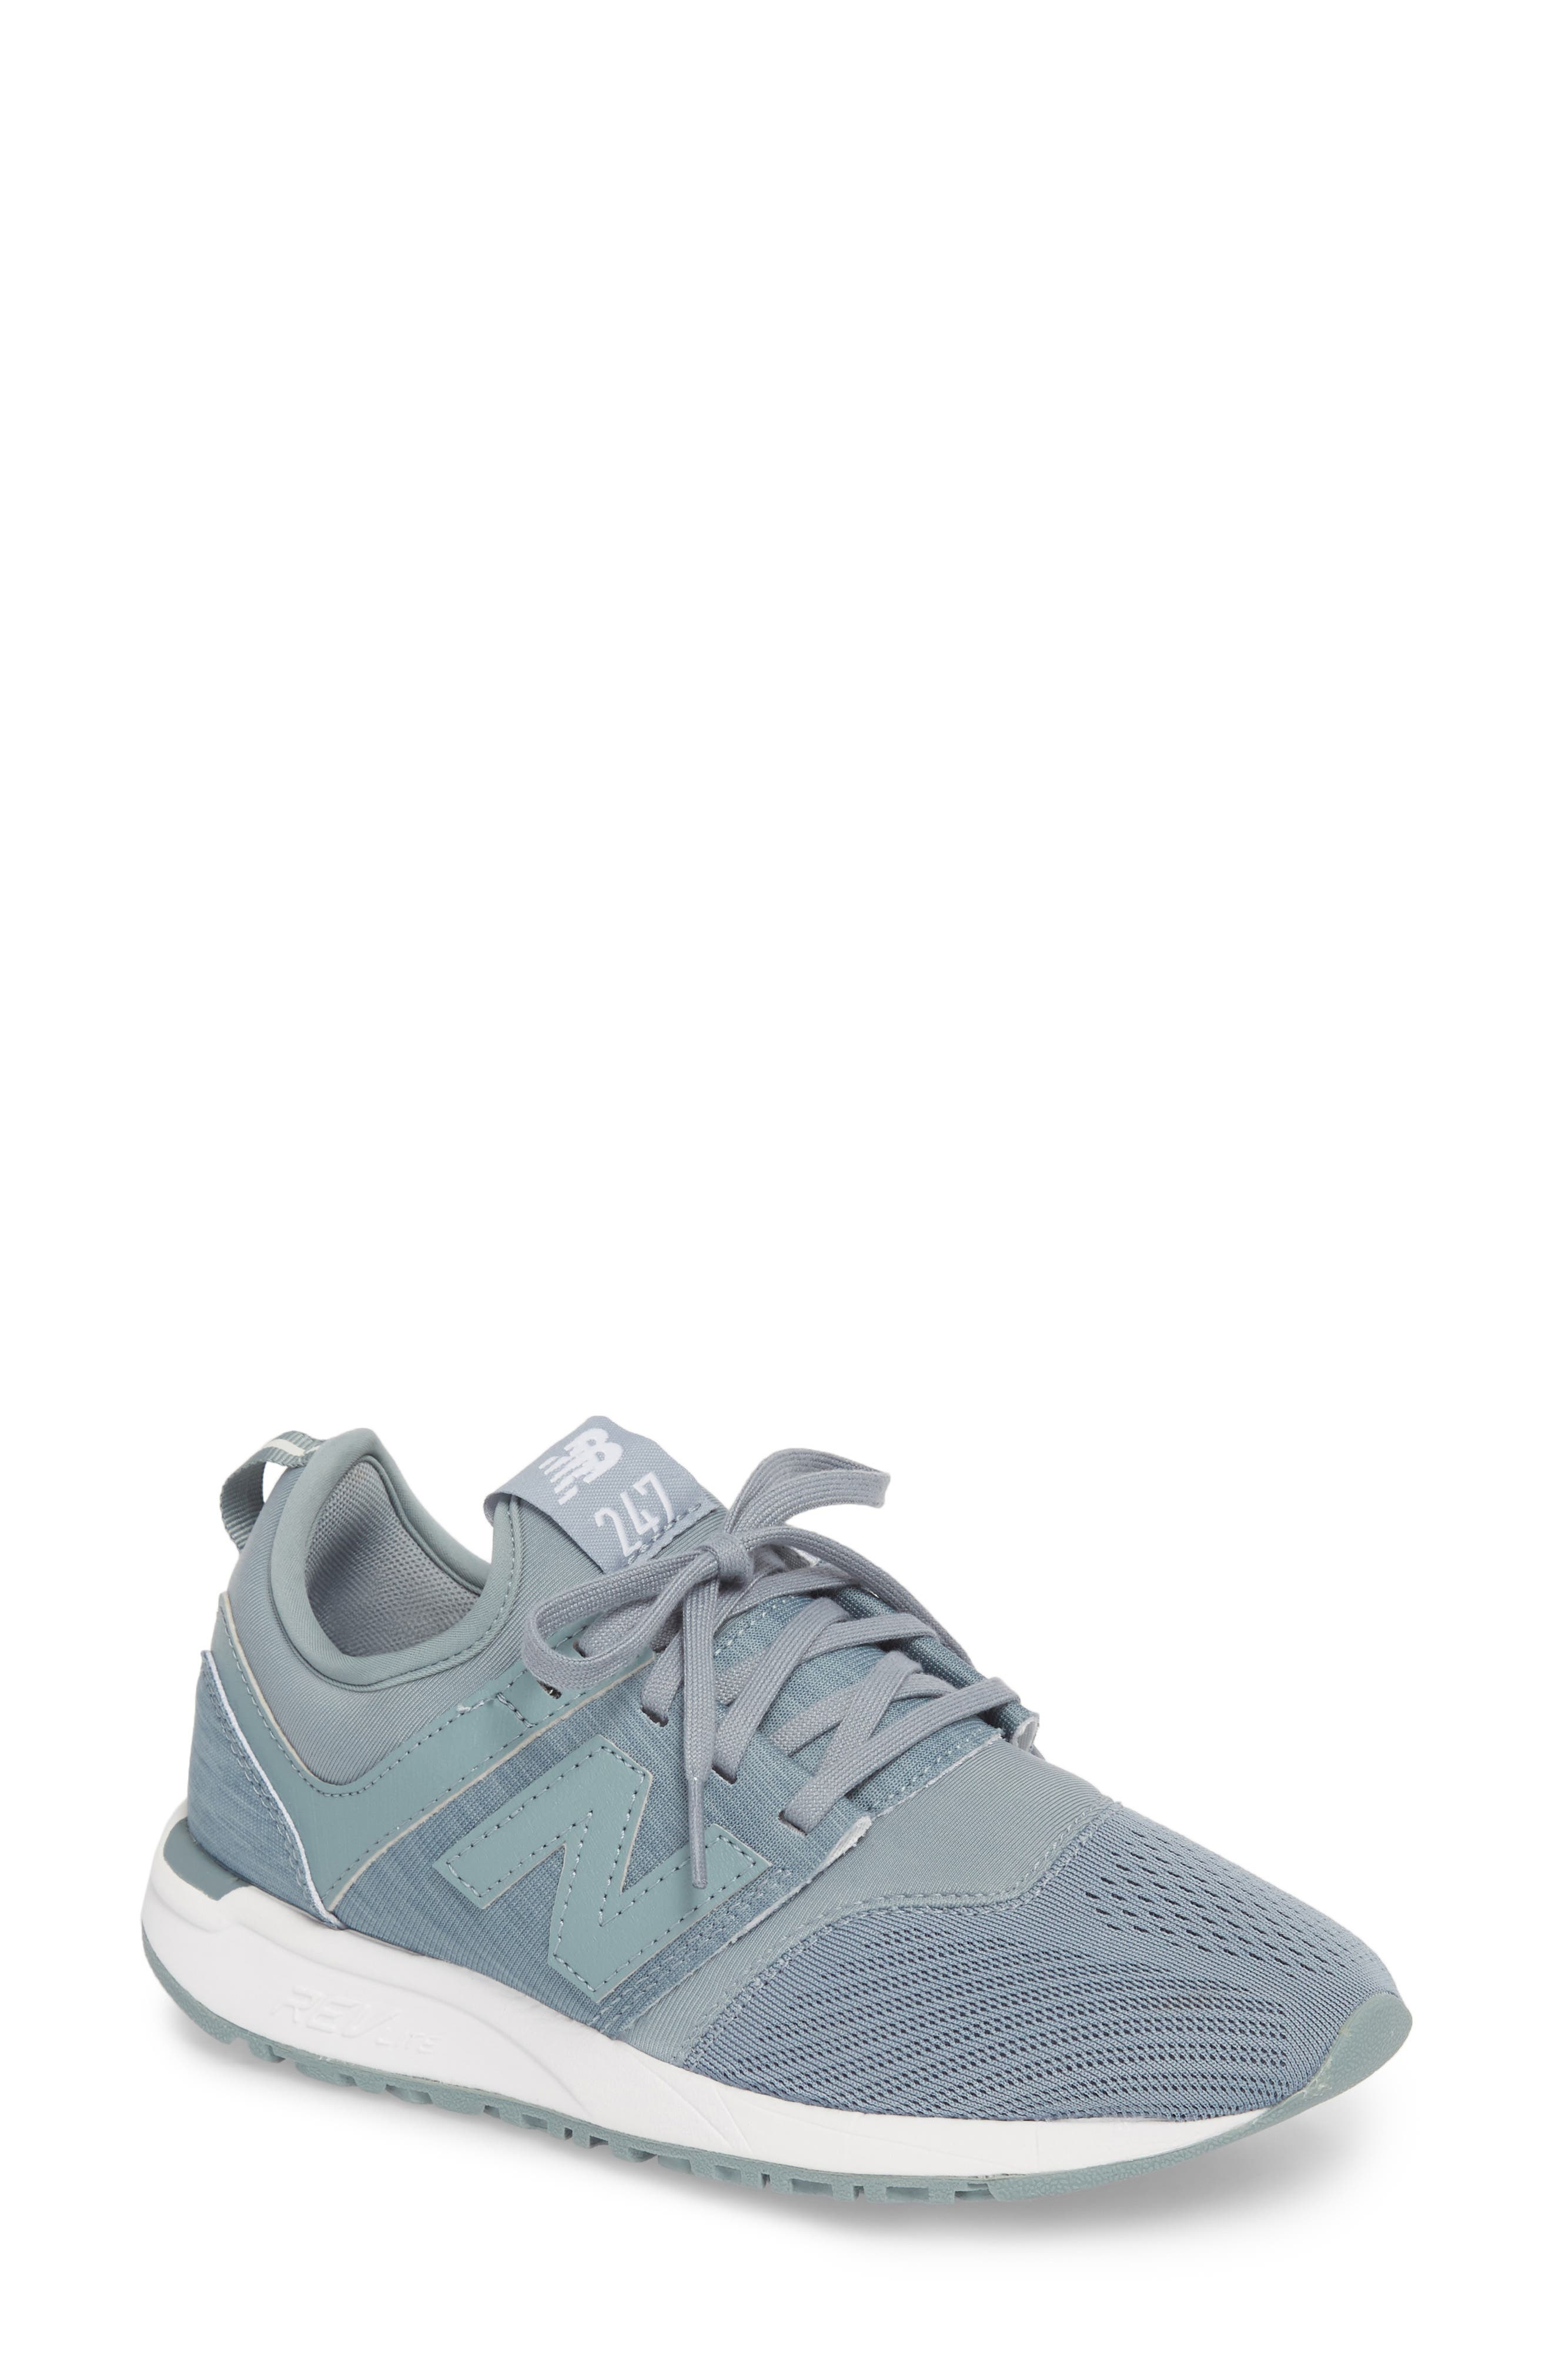 247 Classic Sneaker,                         Main,                         color,